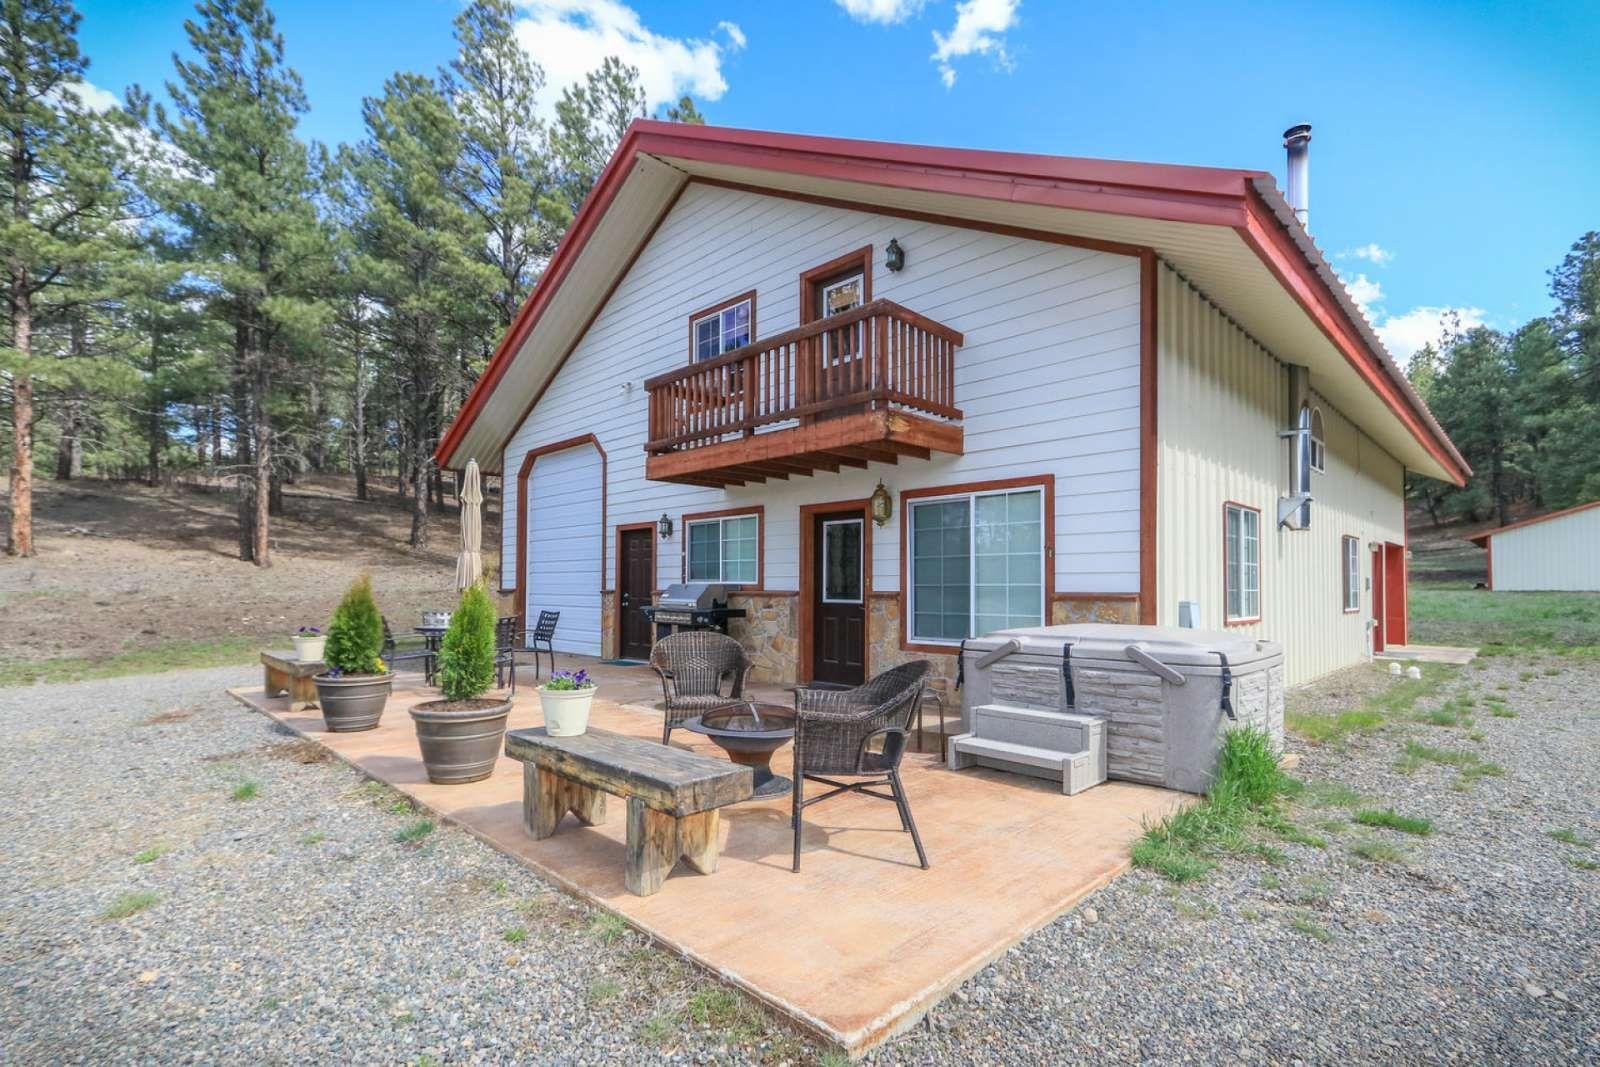 Pagosa Springs Vacation Rental Skyrocket Ranch Home Rental On Itrip Net Colorado Winter Rental Pagosa Vacation Rental Hot Tub Outdoor Pagosa Springs